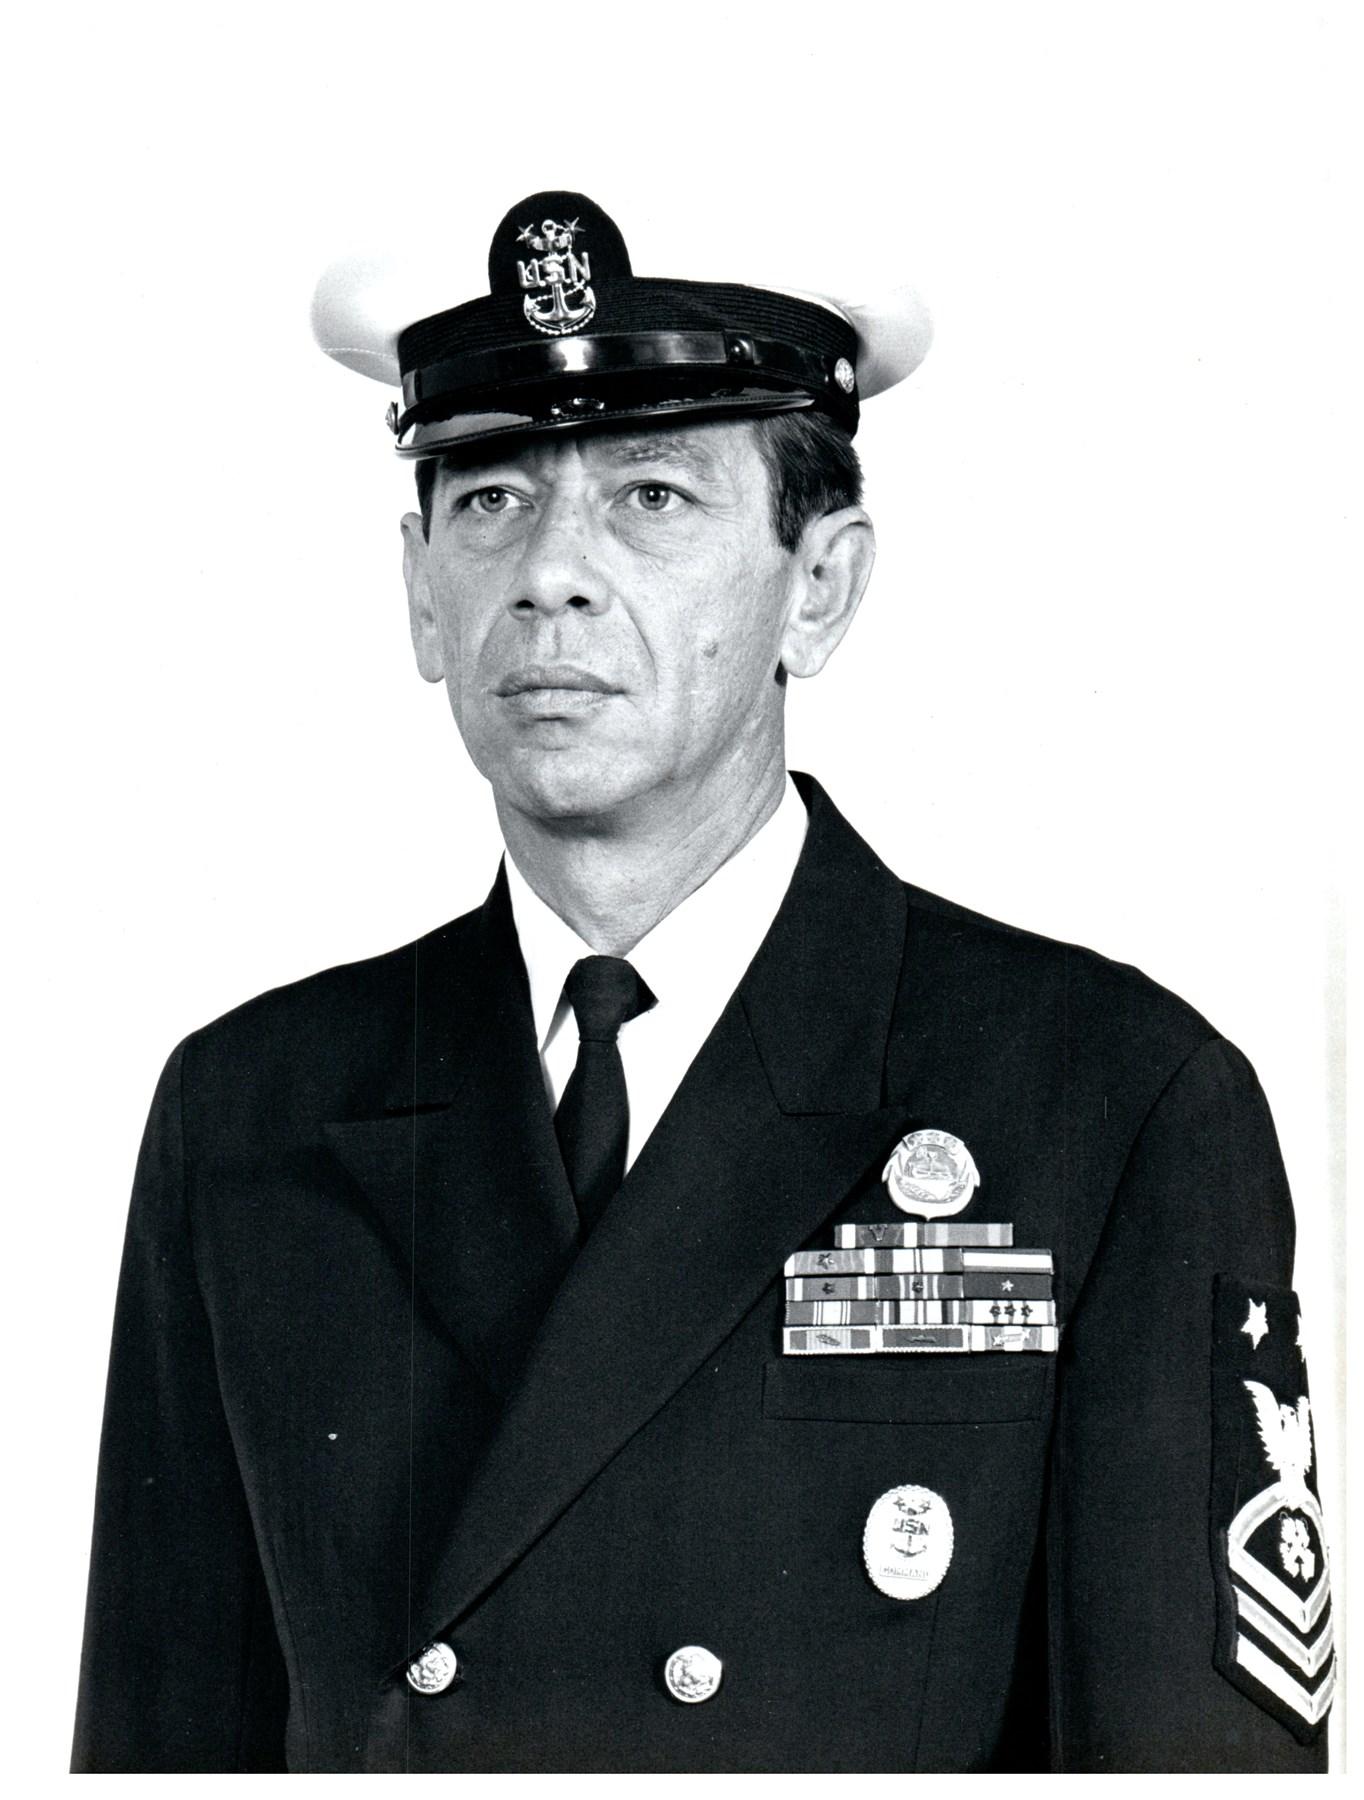 Robert Stucka Obituary - CLEARWATER, FL